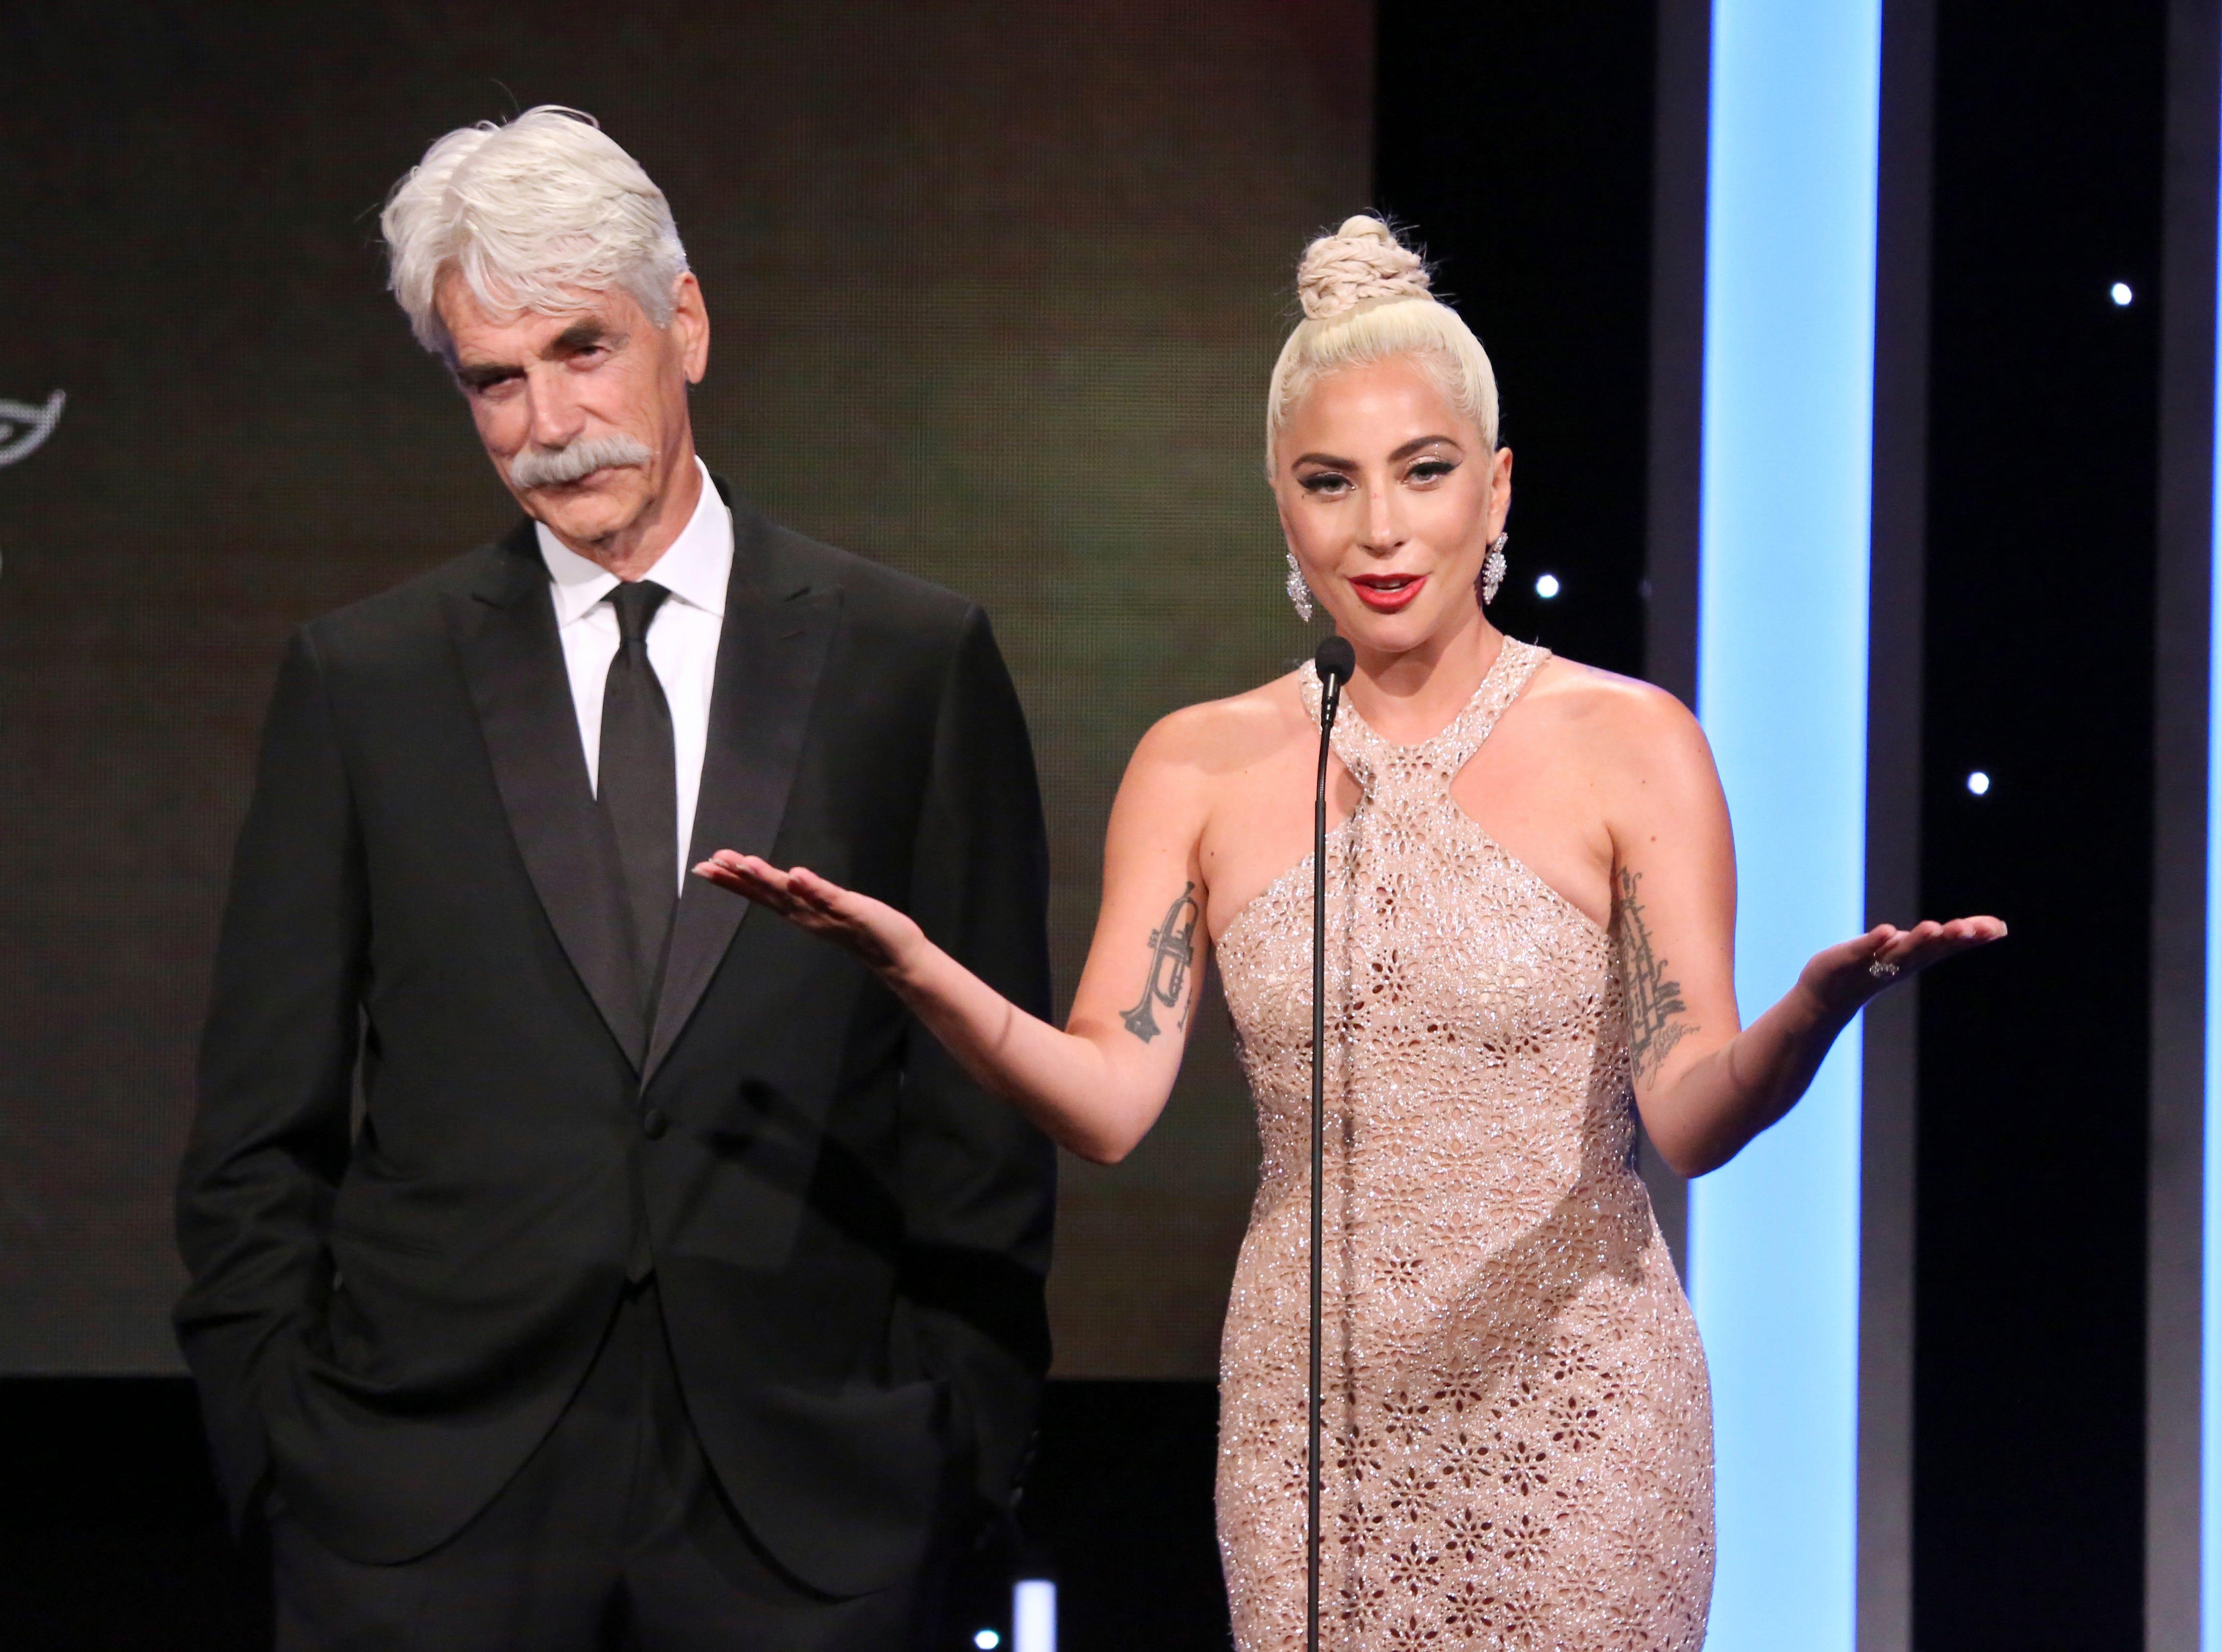 November 29: Sam Elliott and Lady Gaga speak at the American Cinematheque Award ceremony honoring Bradley Cooper.